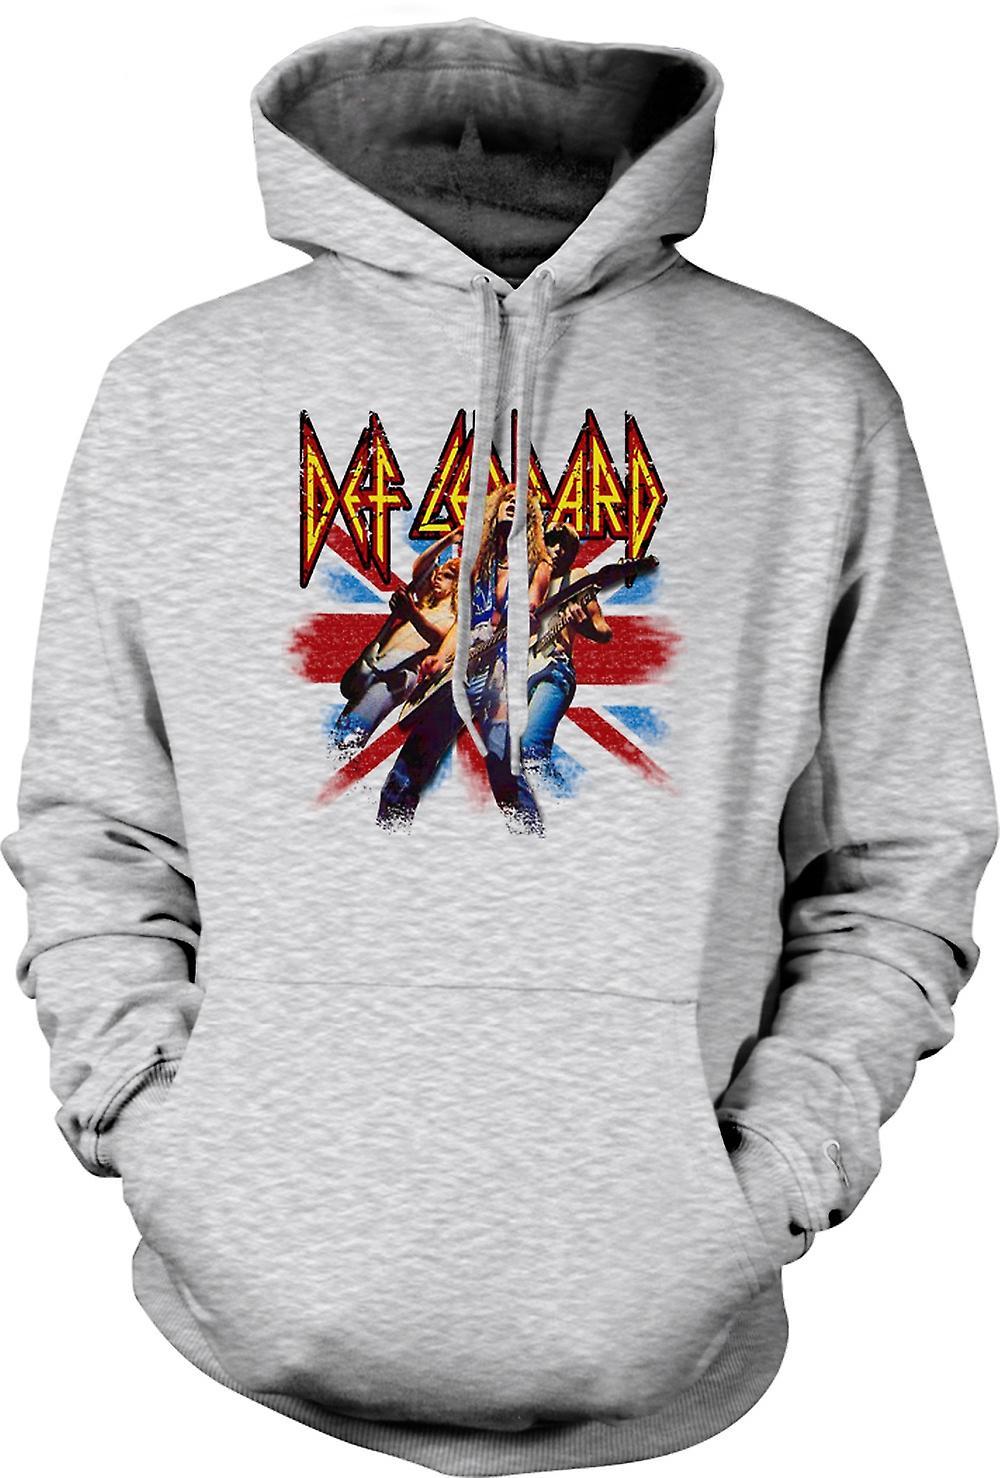 Mens hettegenser - Def Leppard - britisk Rock